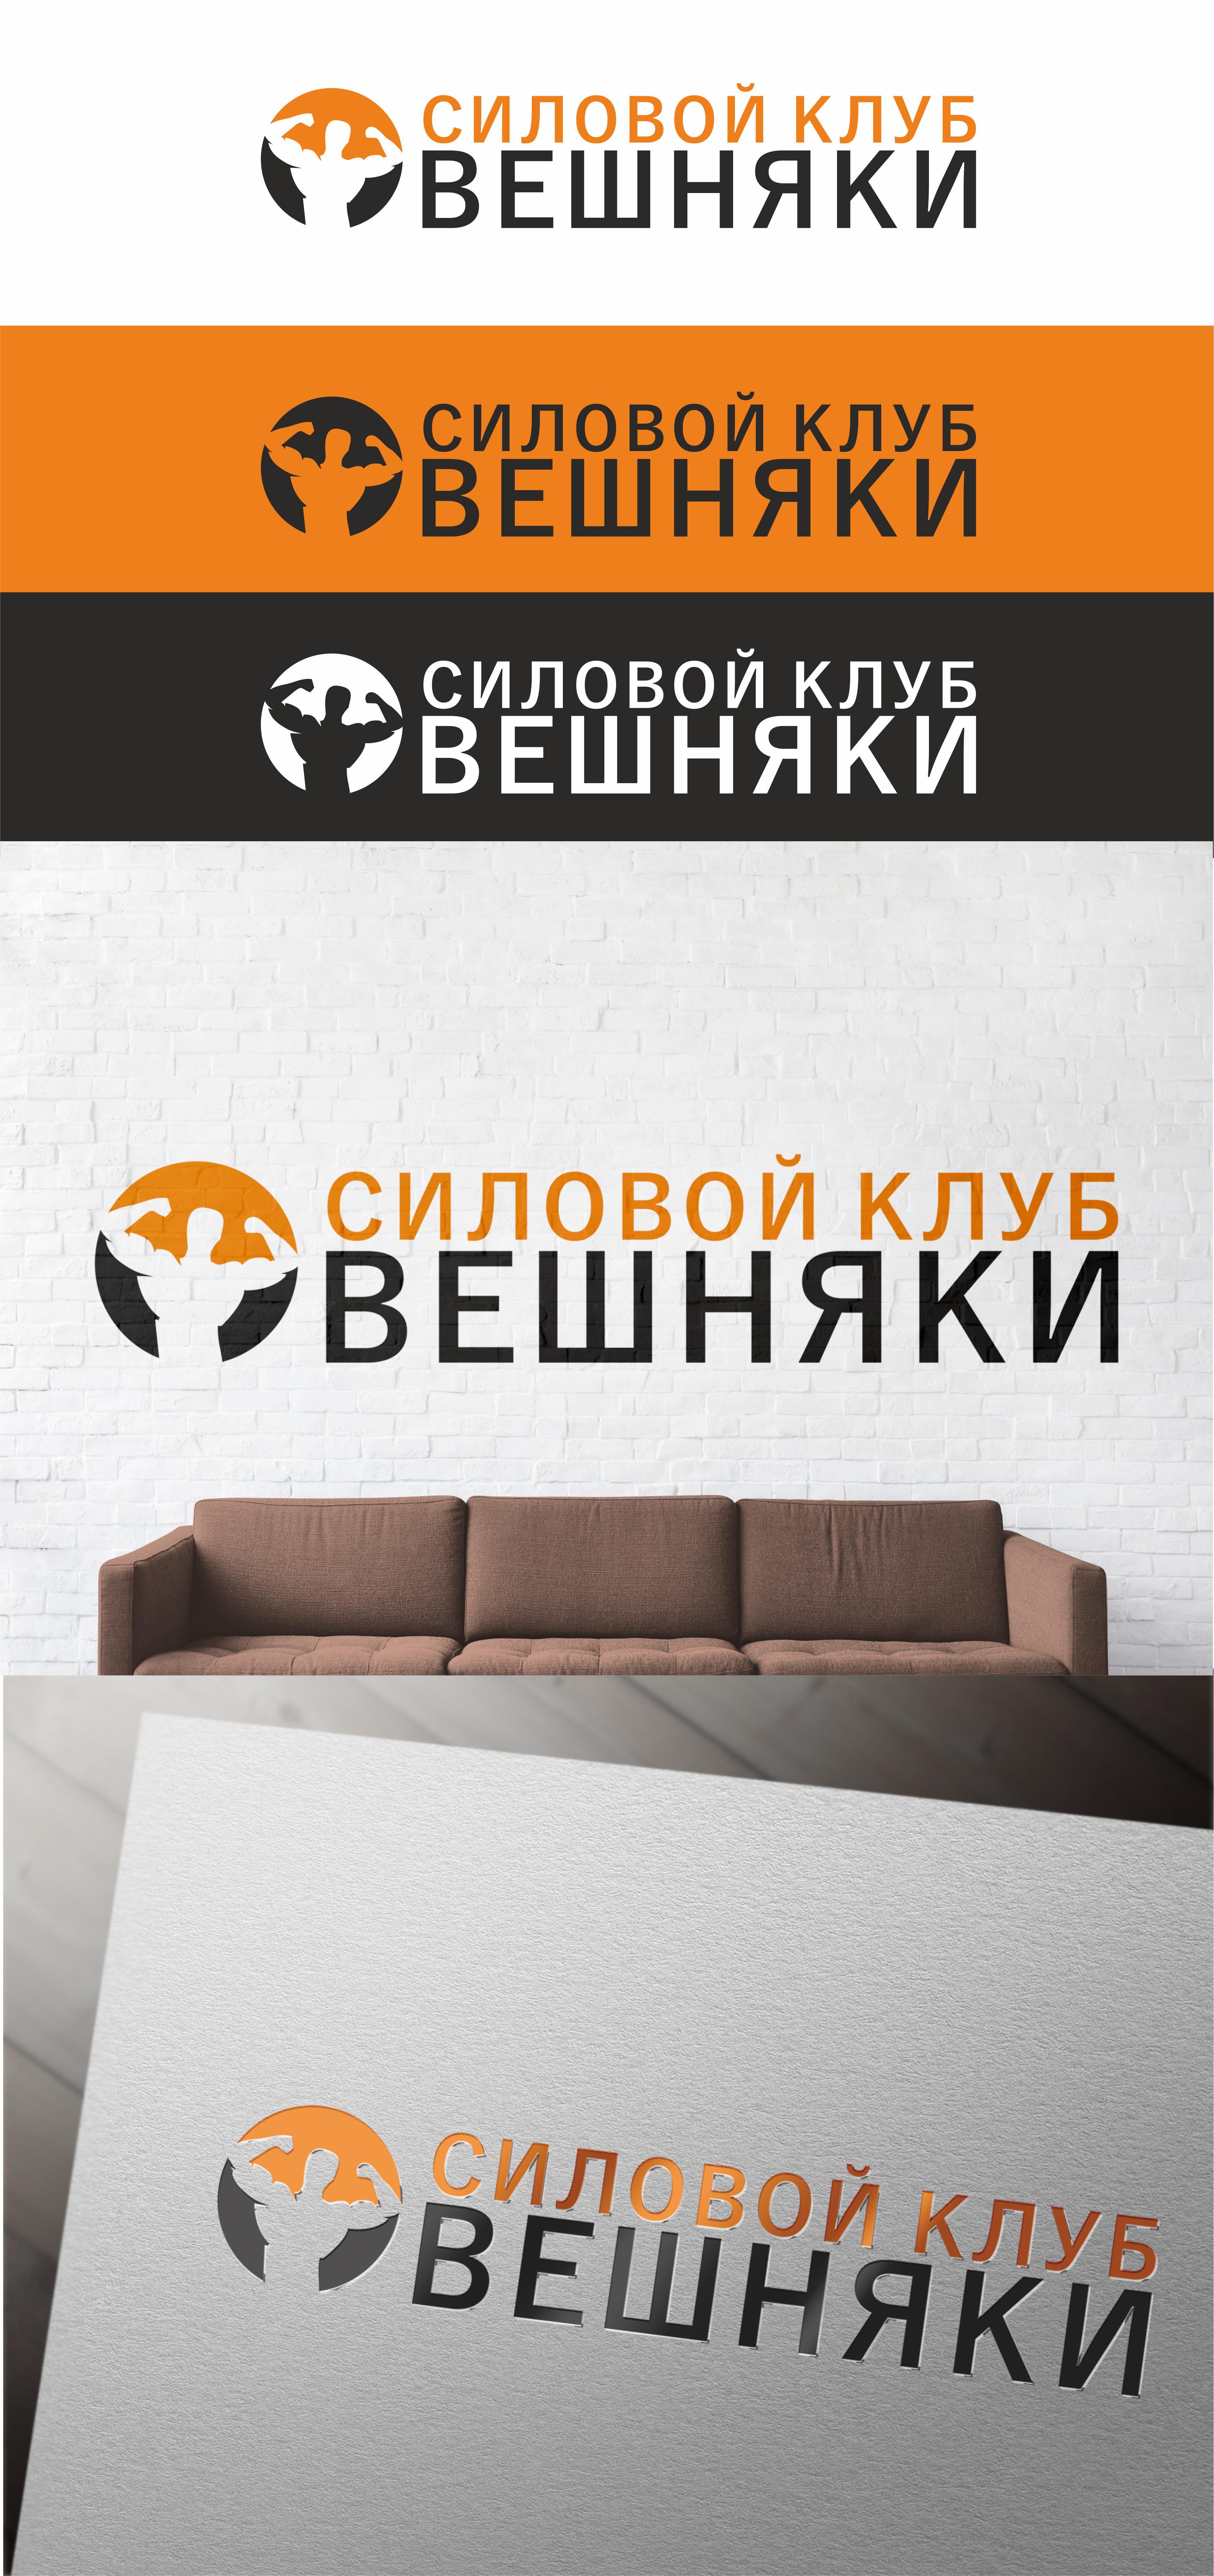 Адаптация (разработка) логотипа Силового клуба ВЕШНЯКИ в инт фото f_1815fb964b1894d3.jpg